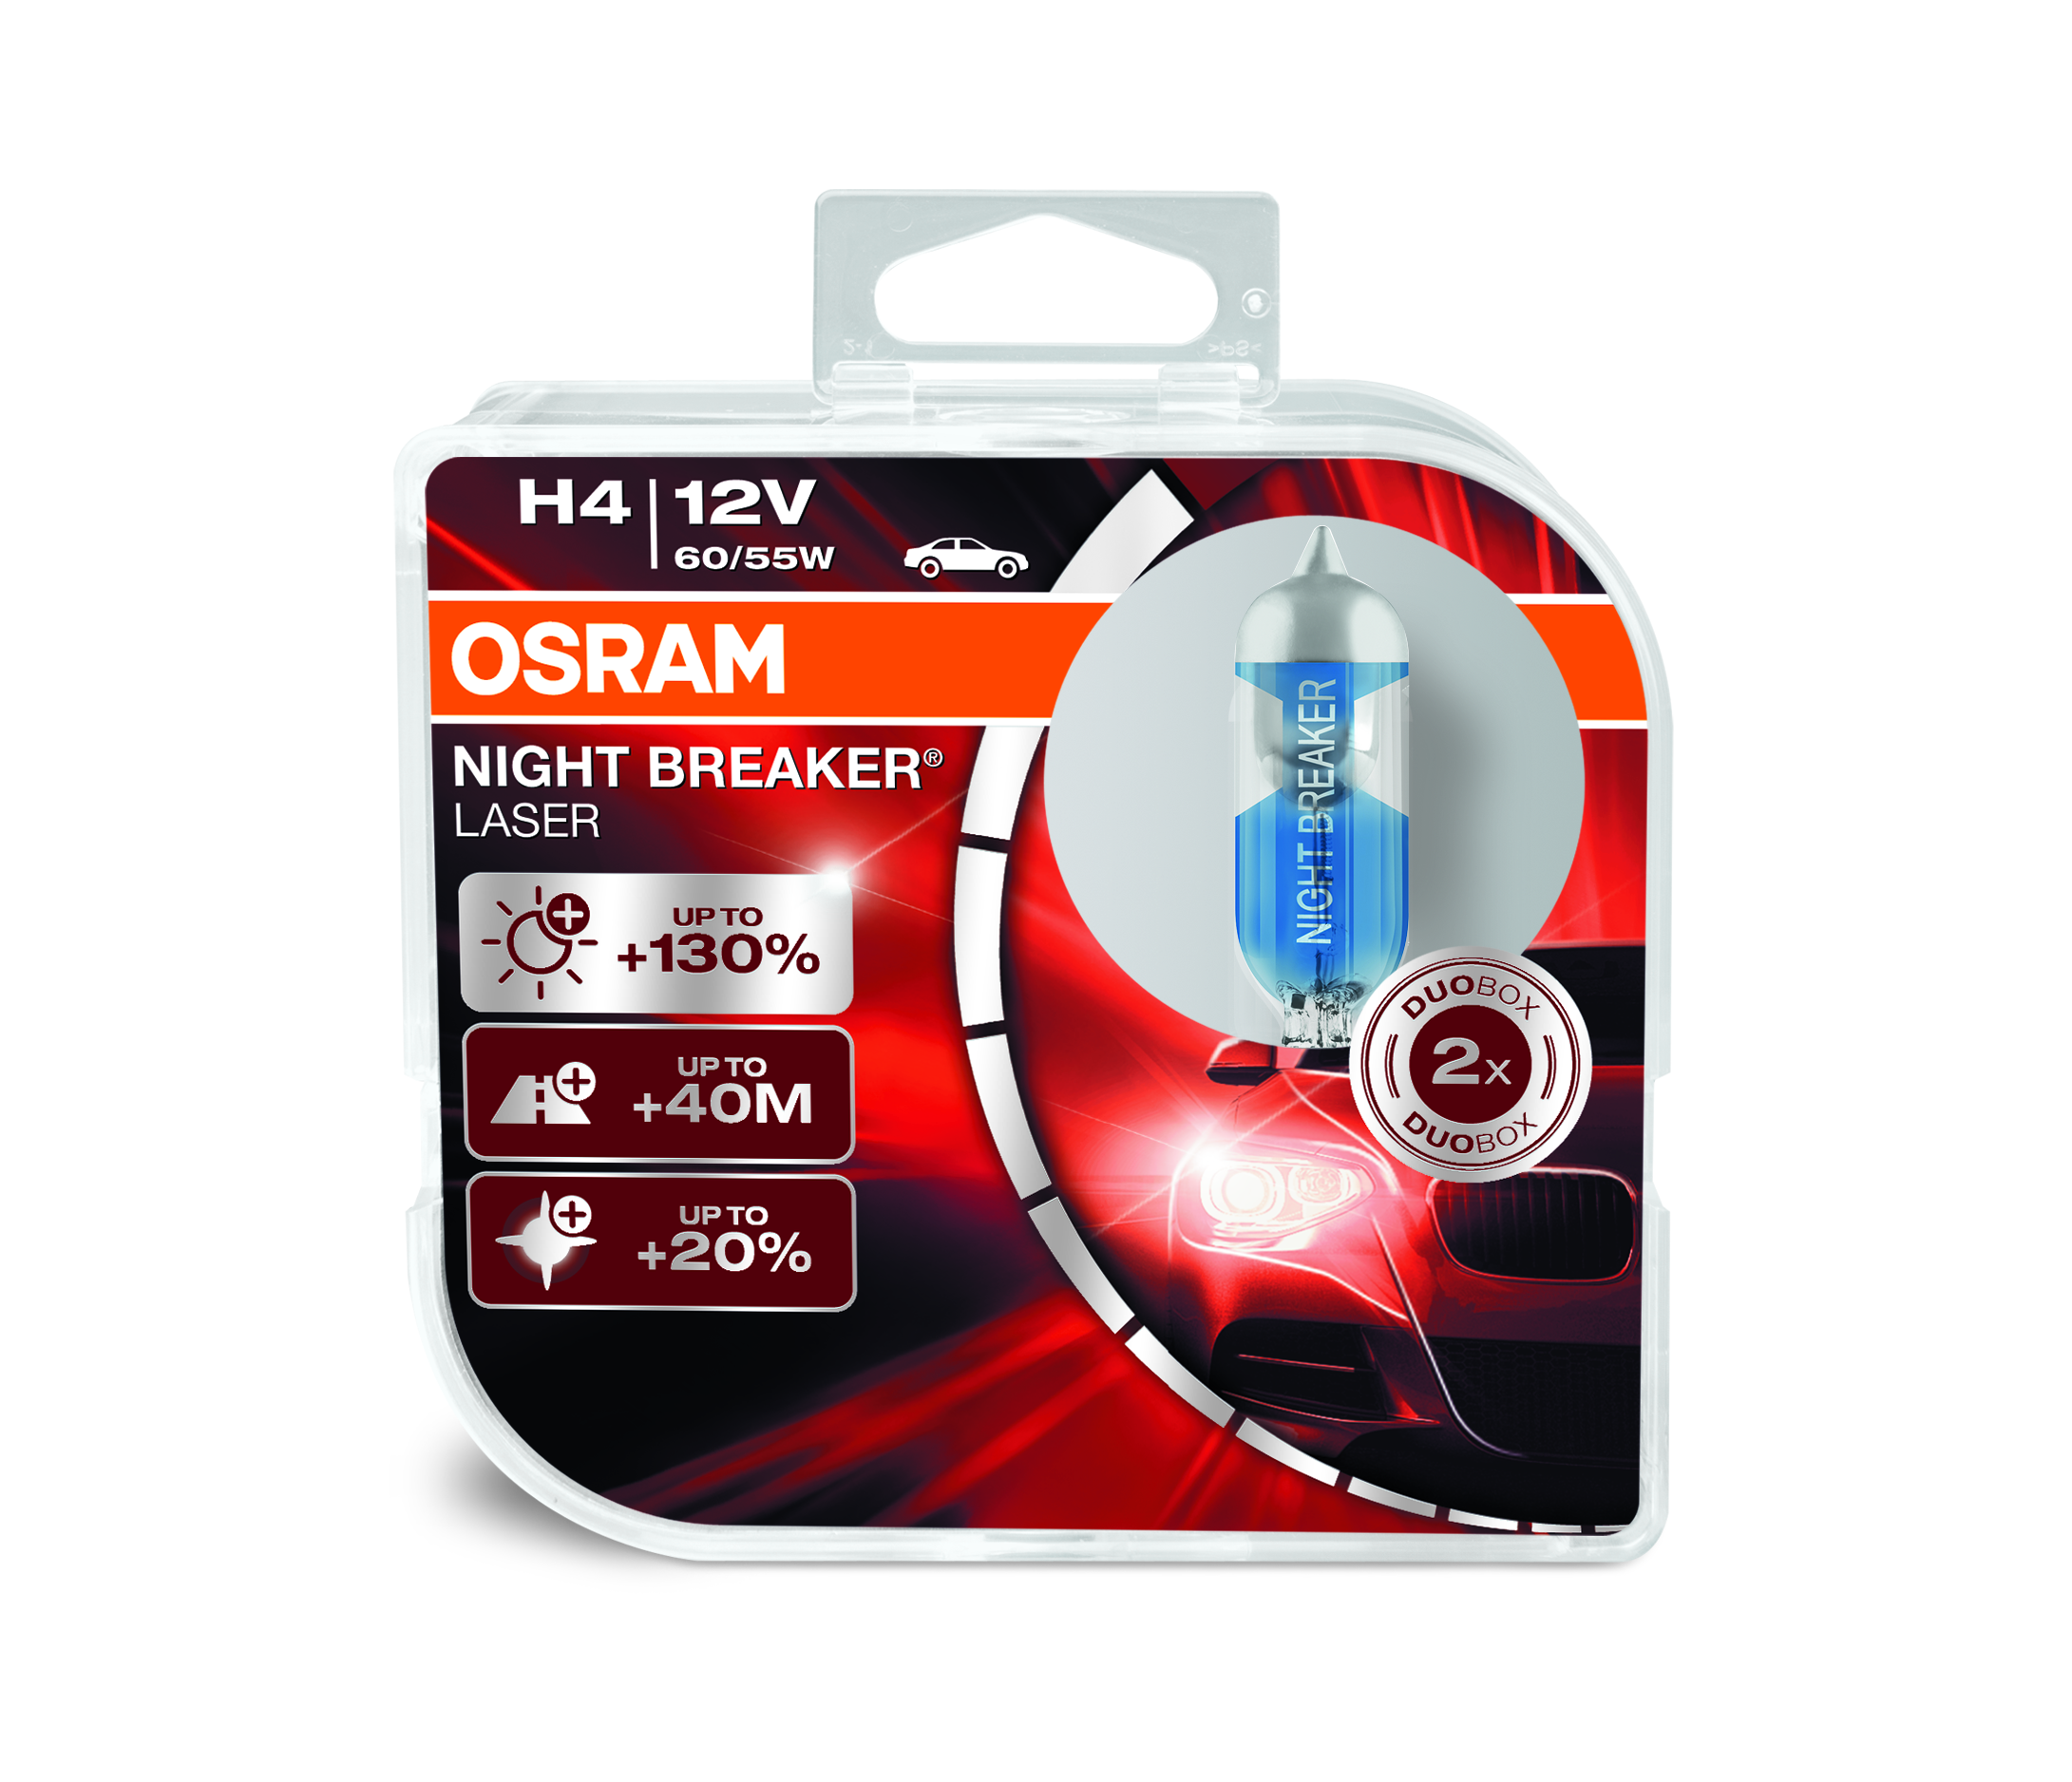 Osram halogenová žárovka, NIGHT BREAKER LASER, H4, P43t, 12V, 60/55W, 64193NBL-HCB